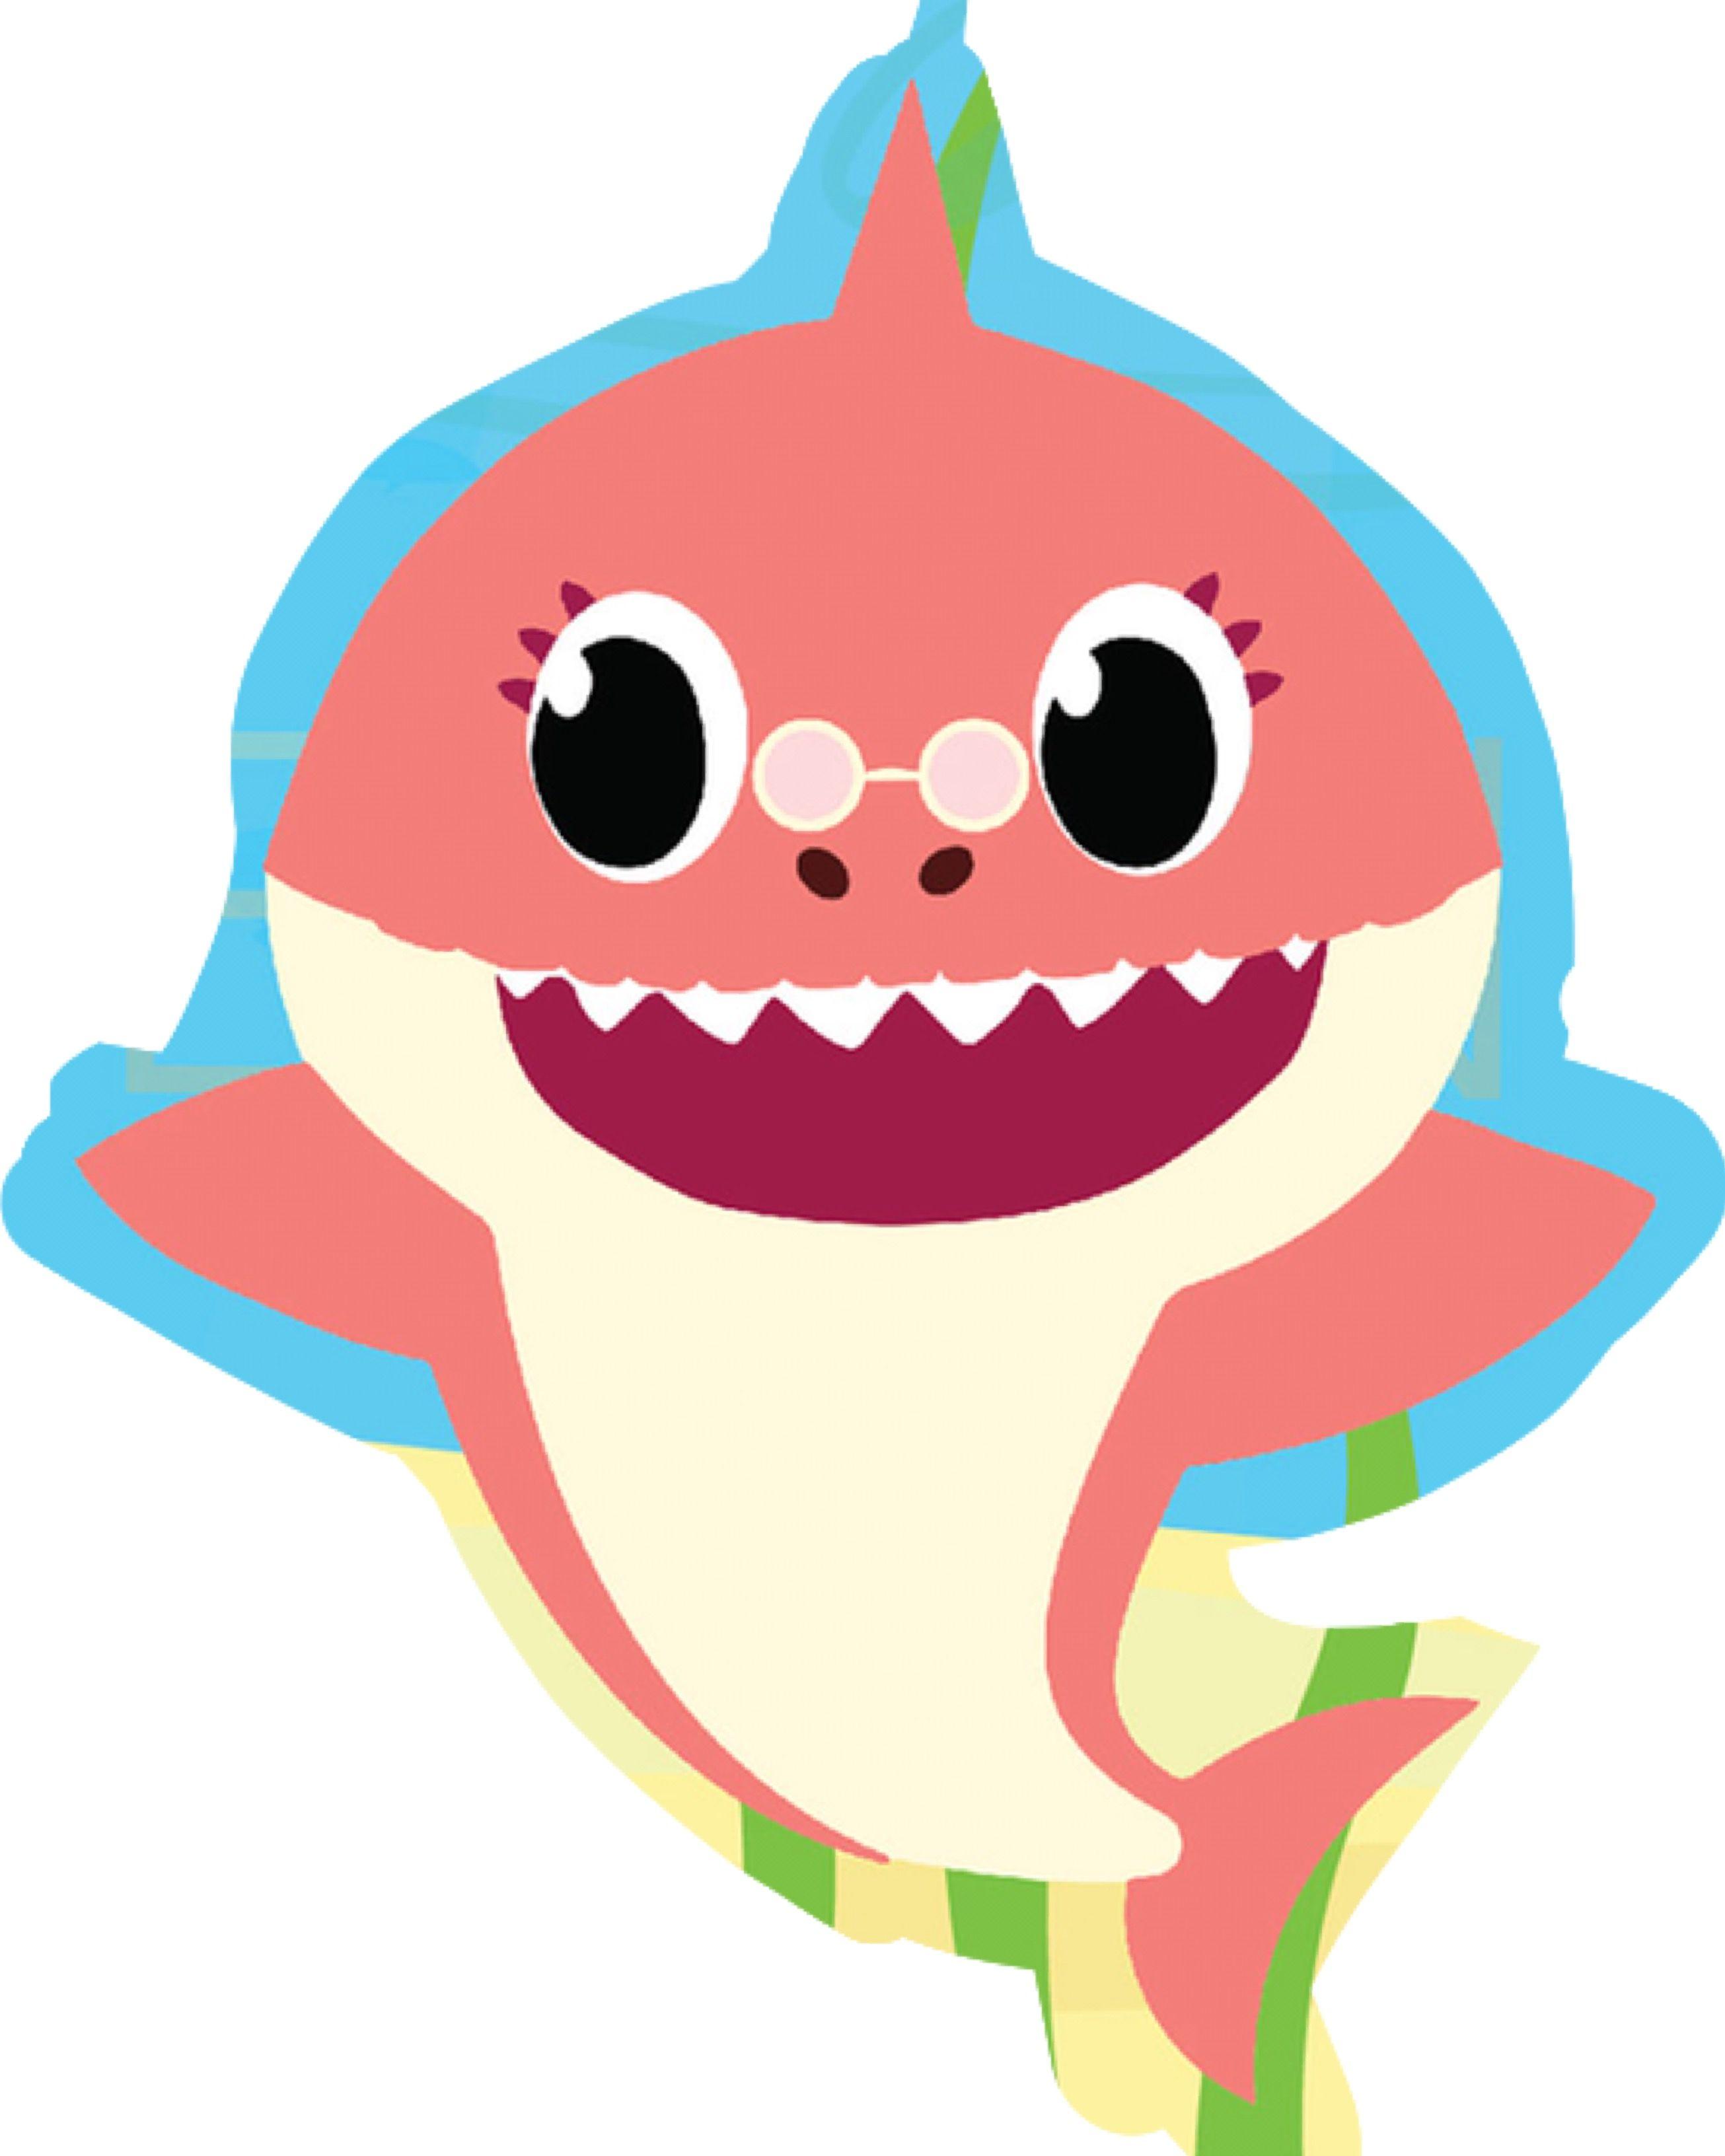 Rođendan | Baby shark in 2019 | Baby shark, Shark, Shark party